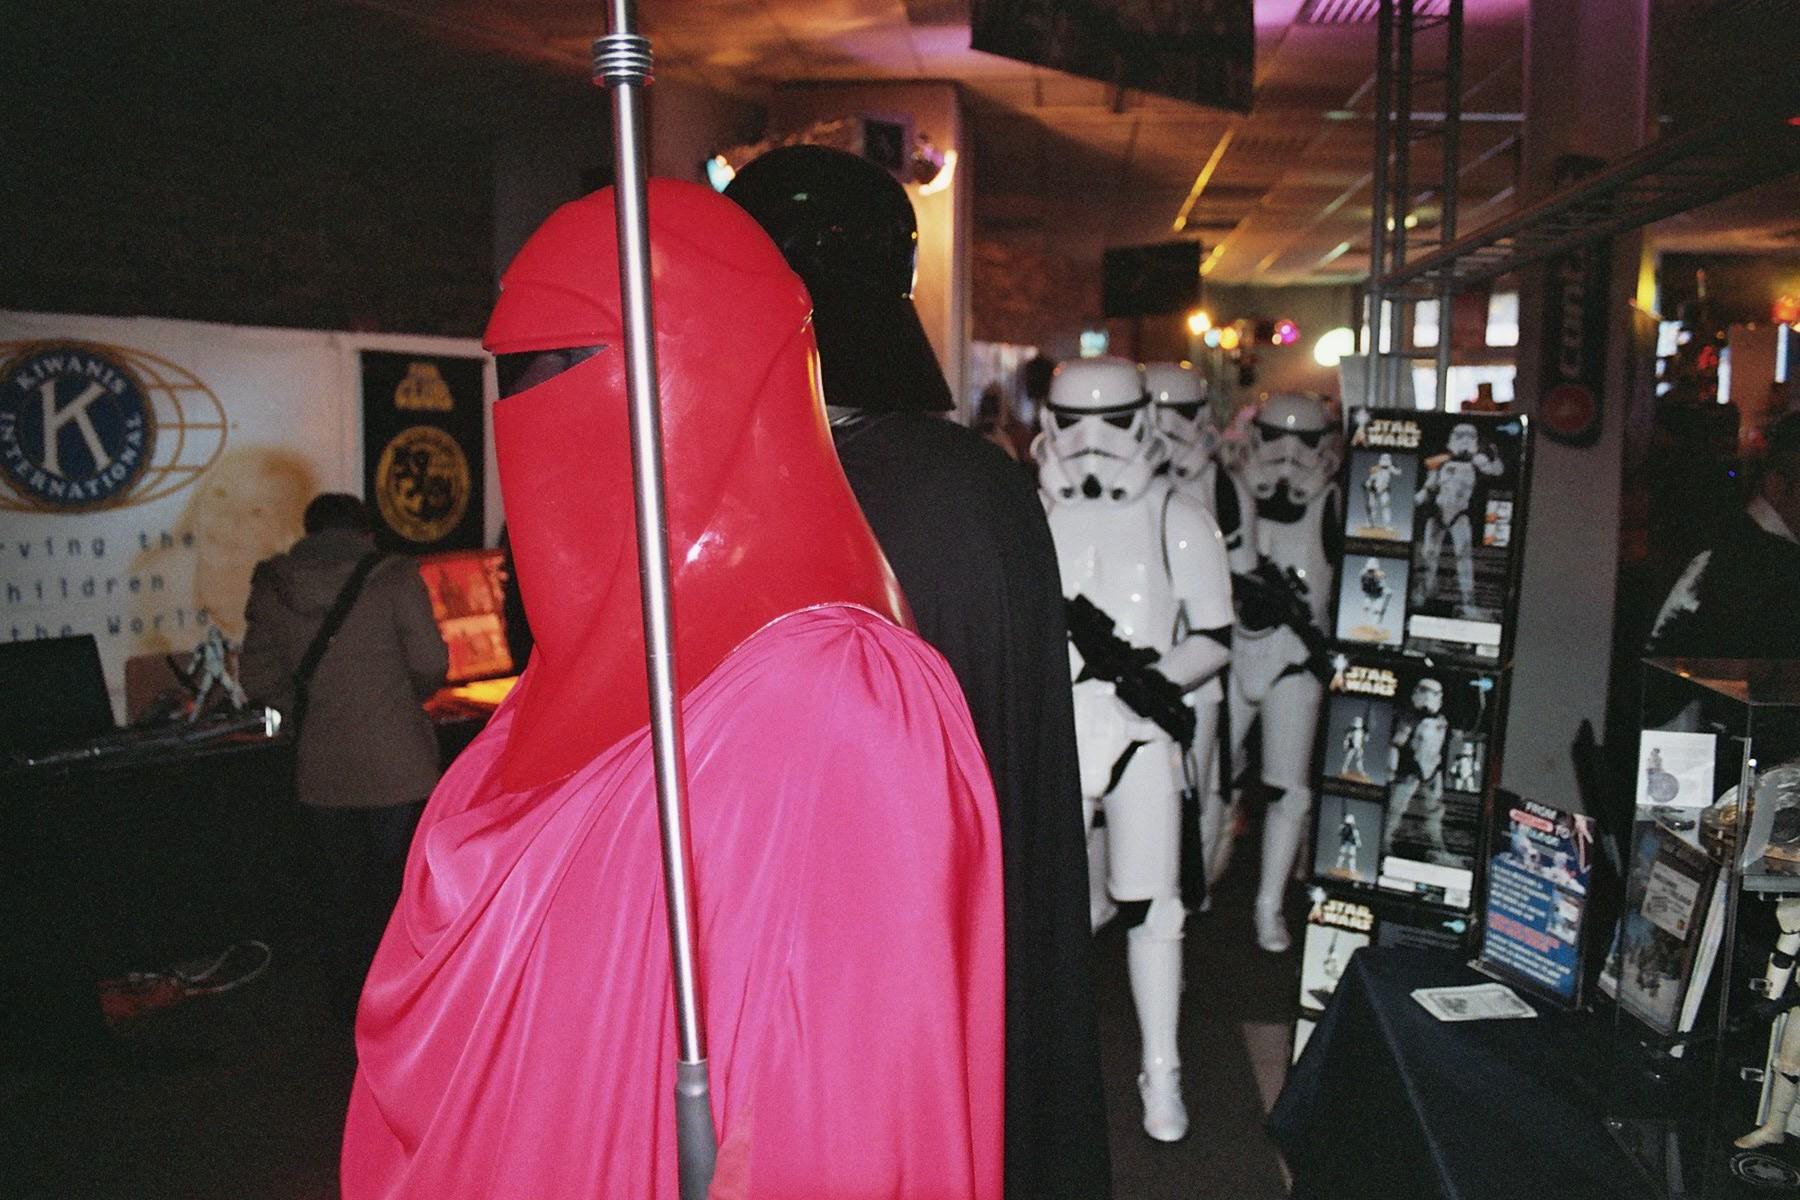 Photo 125 - Darth Vader arrive